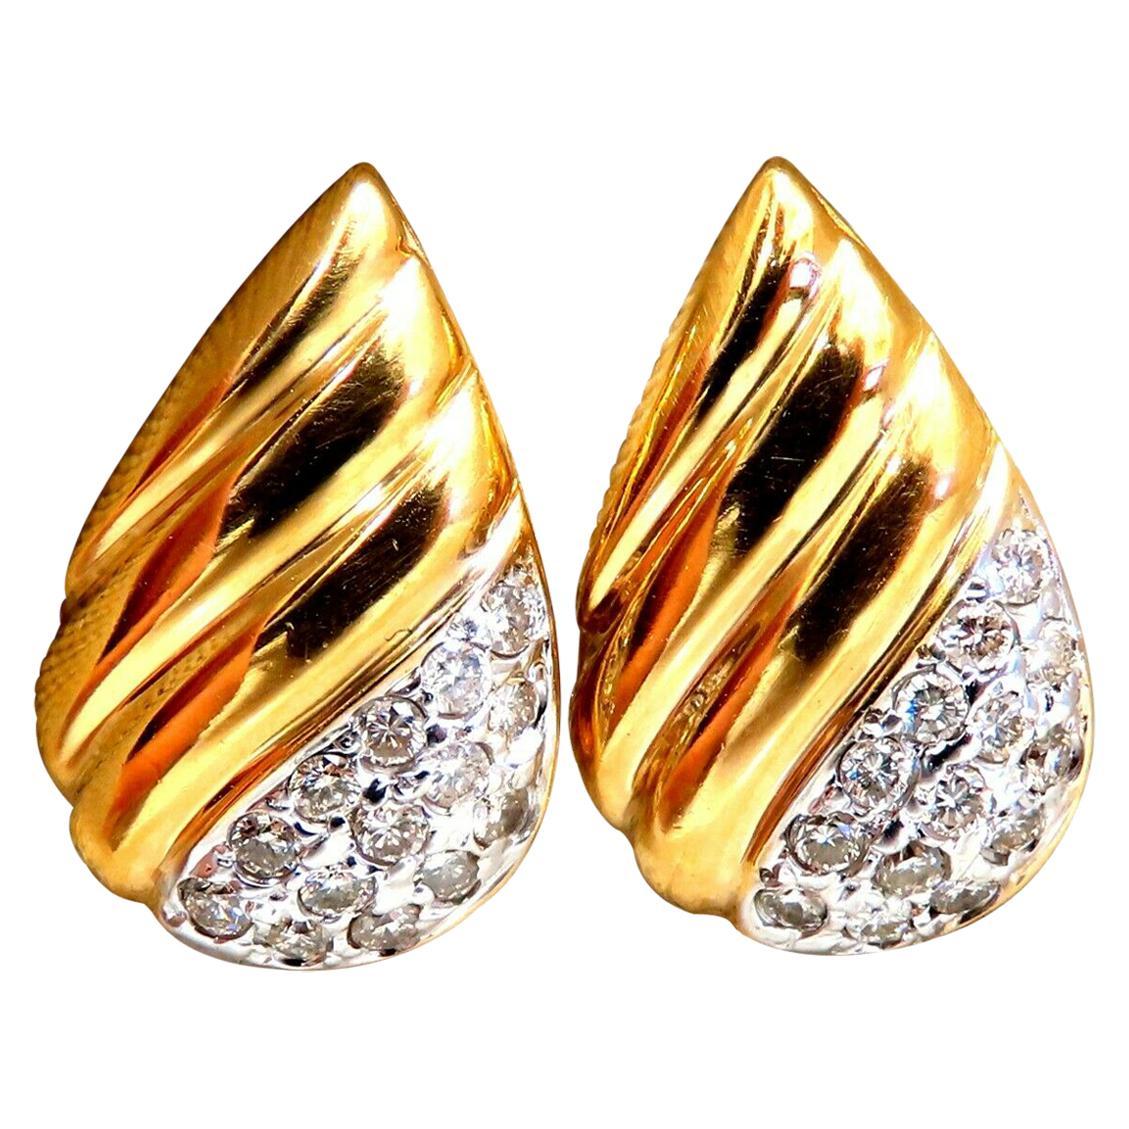 .30 Carat Natural Diamond Tear Drop Earrings 14 Karat